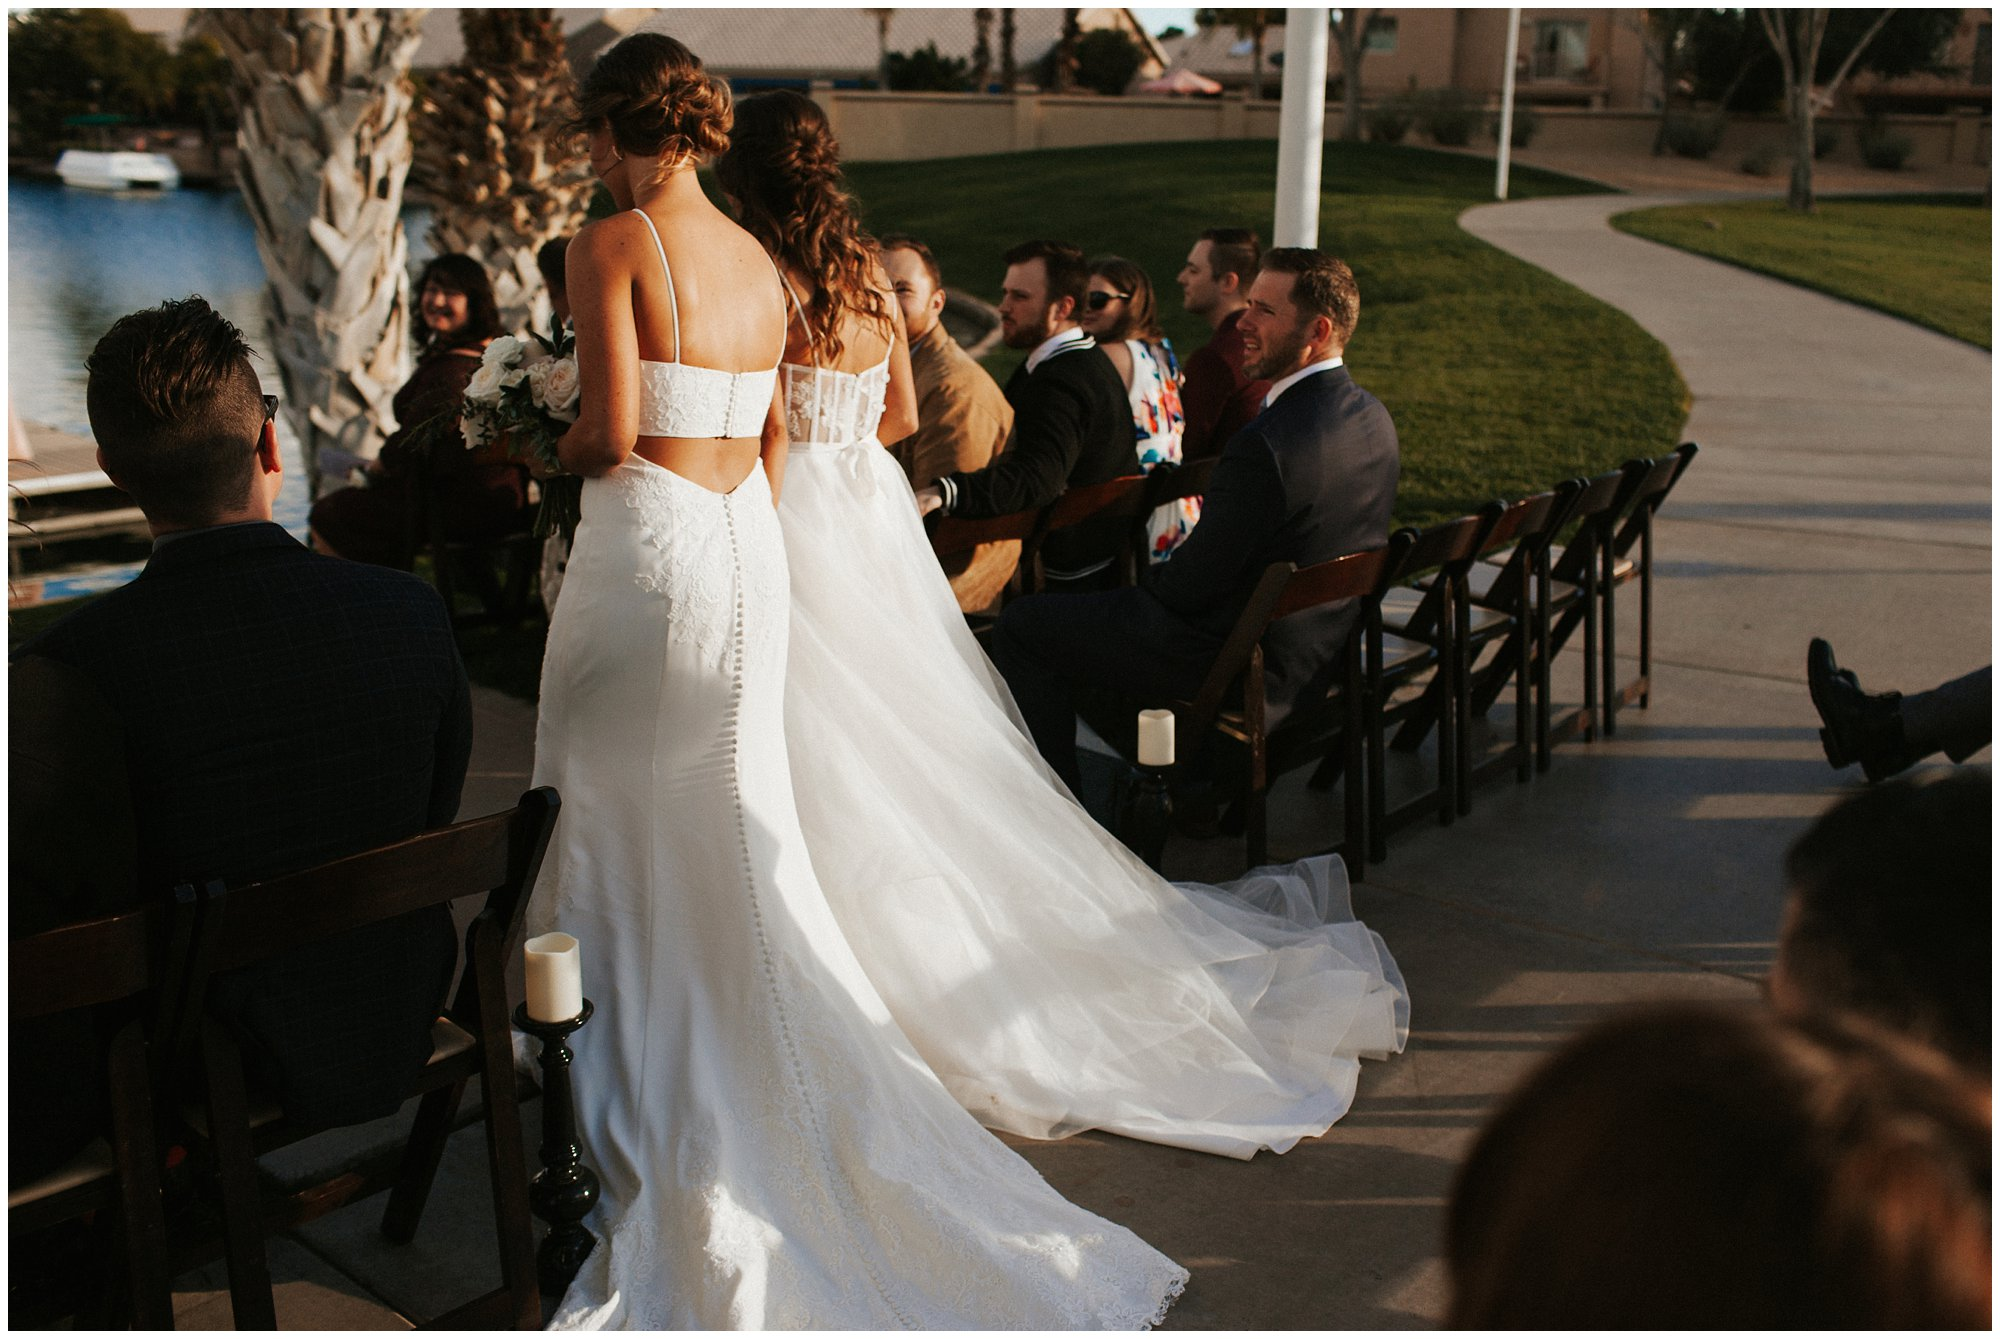 arizona same sex wedding photographer - jenni and lauren wedding the islands clubhouse_0057.jpg